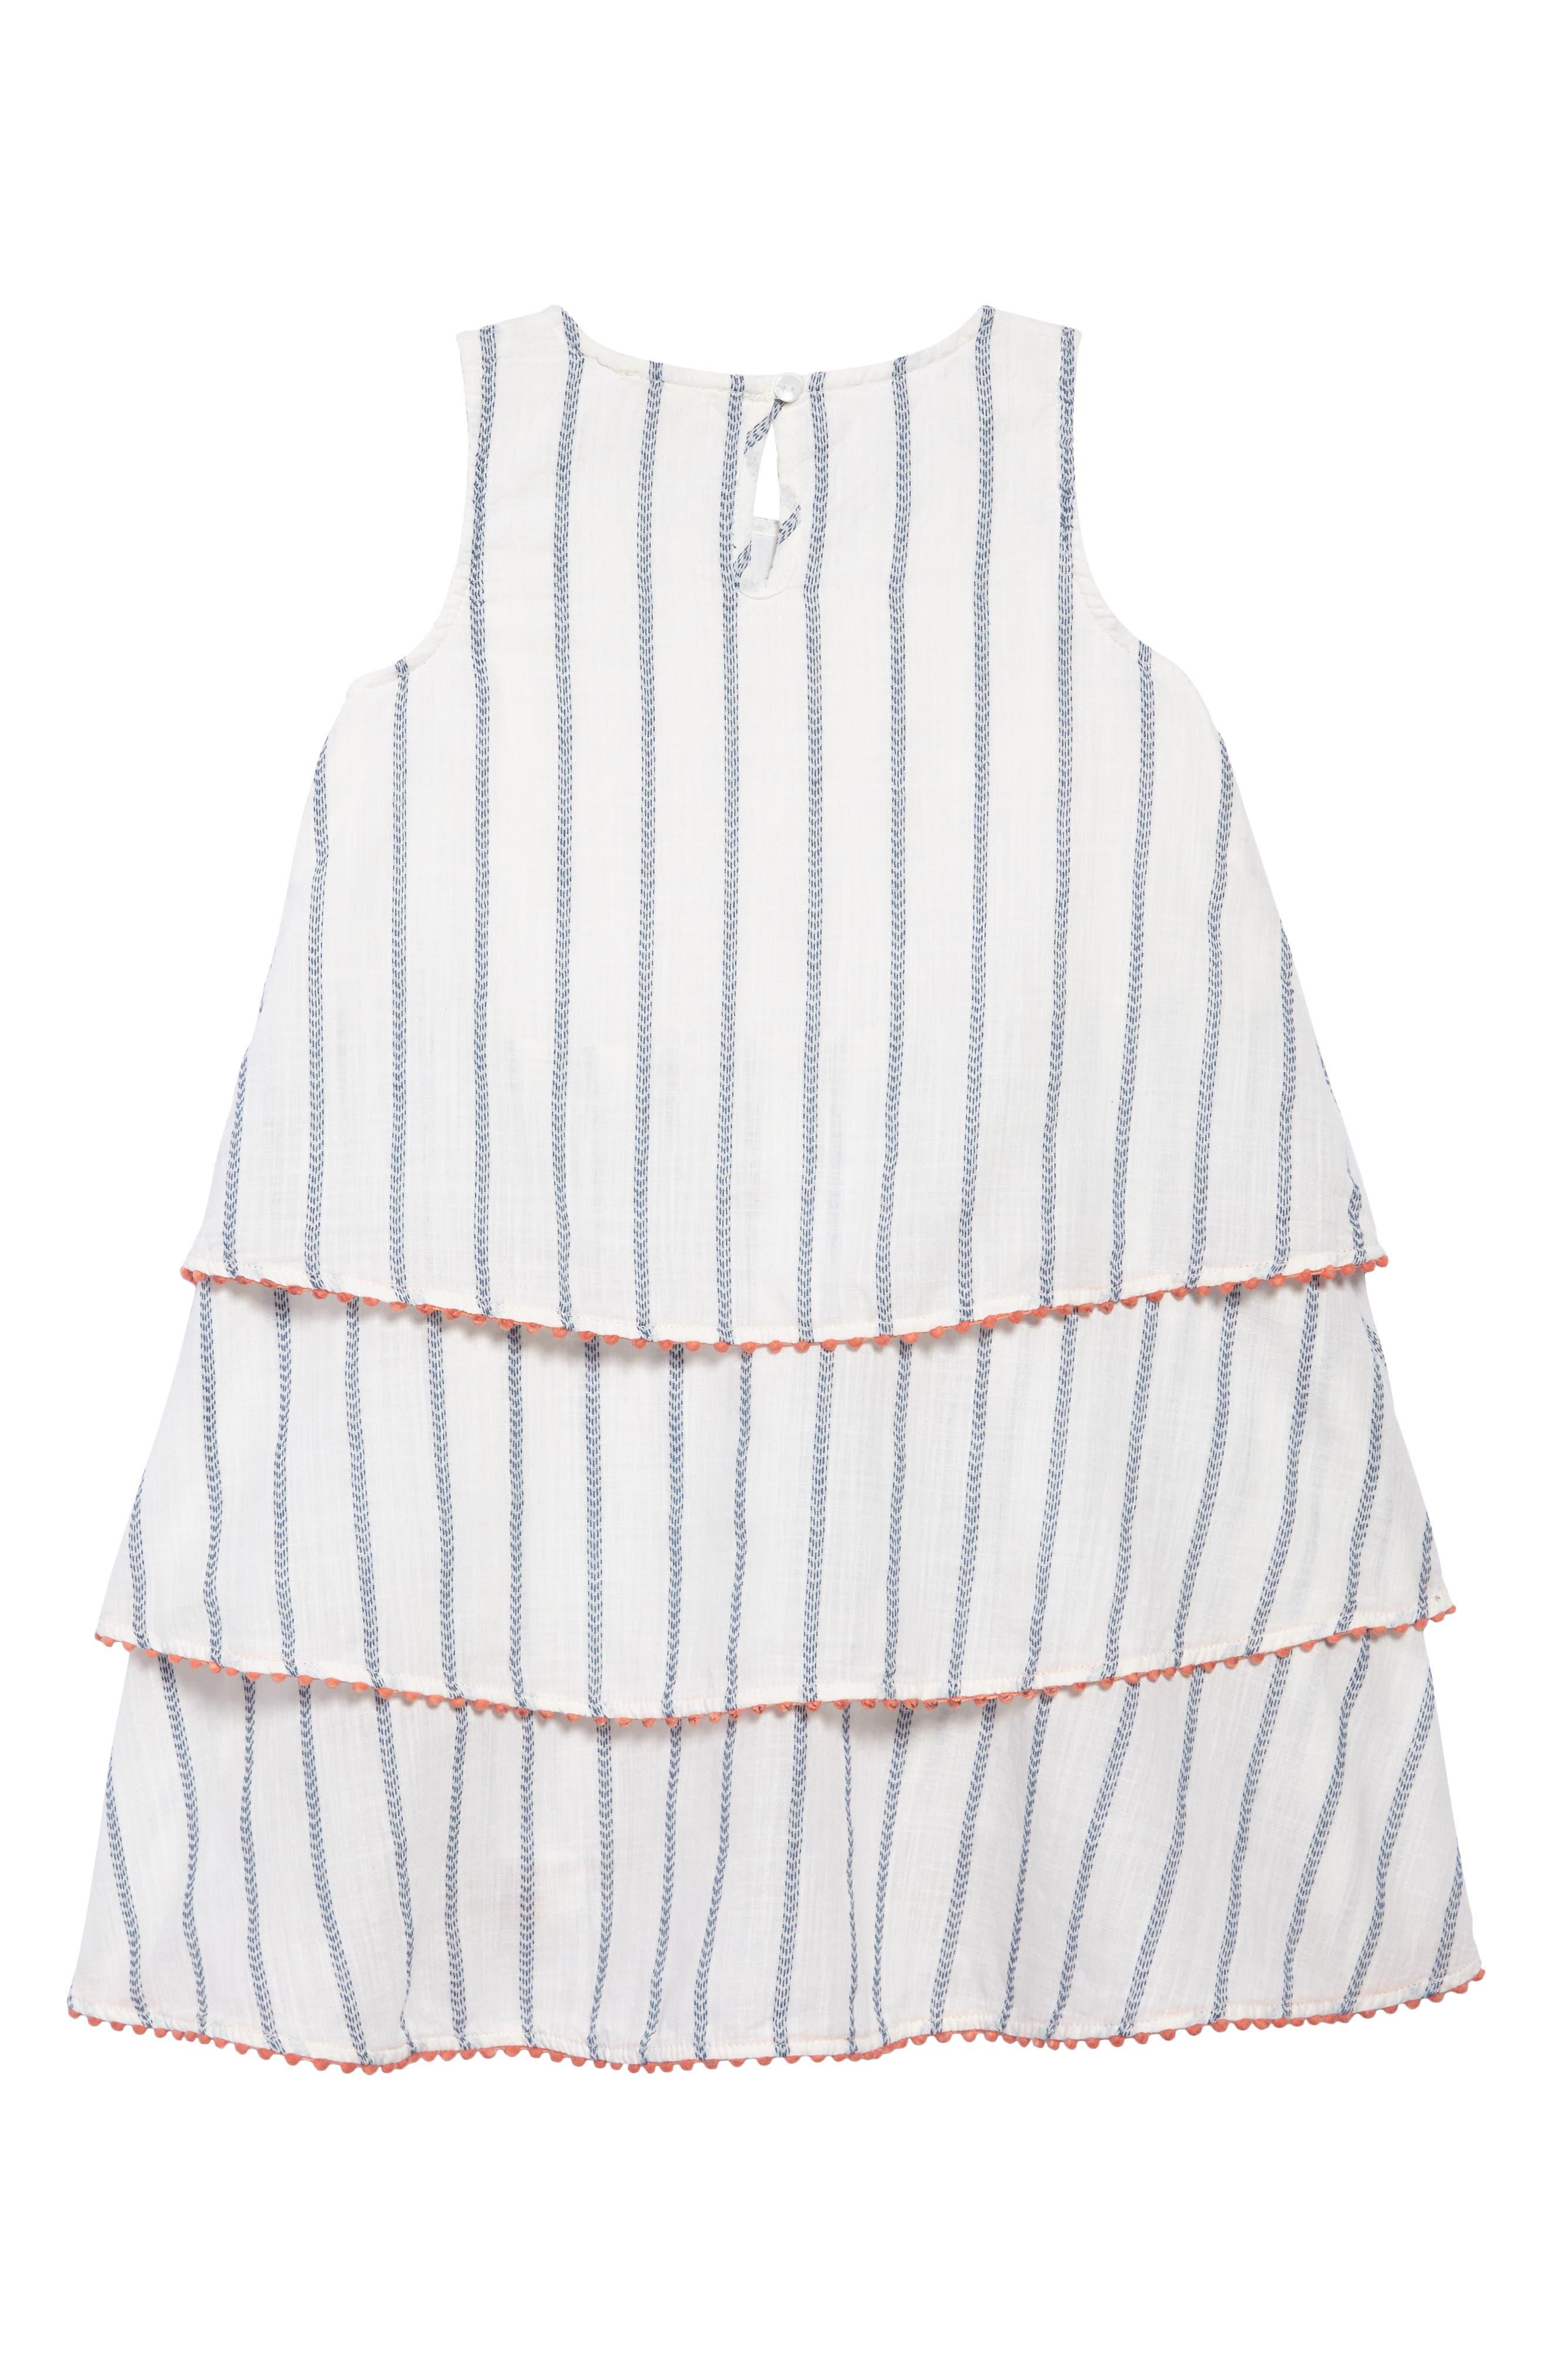 Tiered Woven Dress,                             Alternate thumbnail 2, color,                             WHITE- BLUE STRIPE